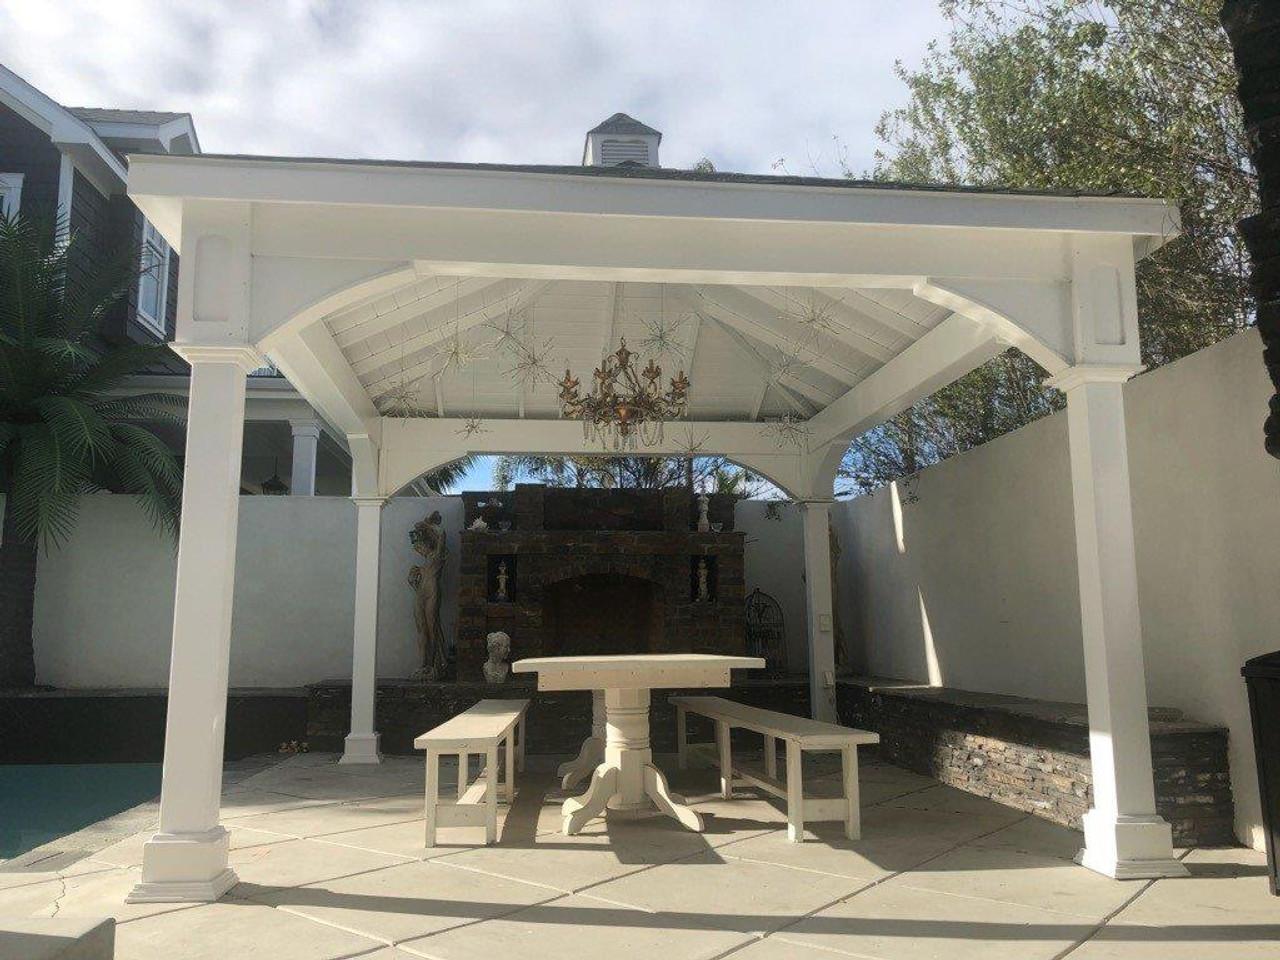 12x14 Pavilion Vinyl Traditional (Hip) Roof, Coronado, CA